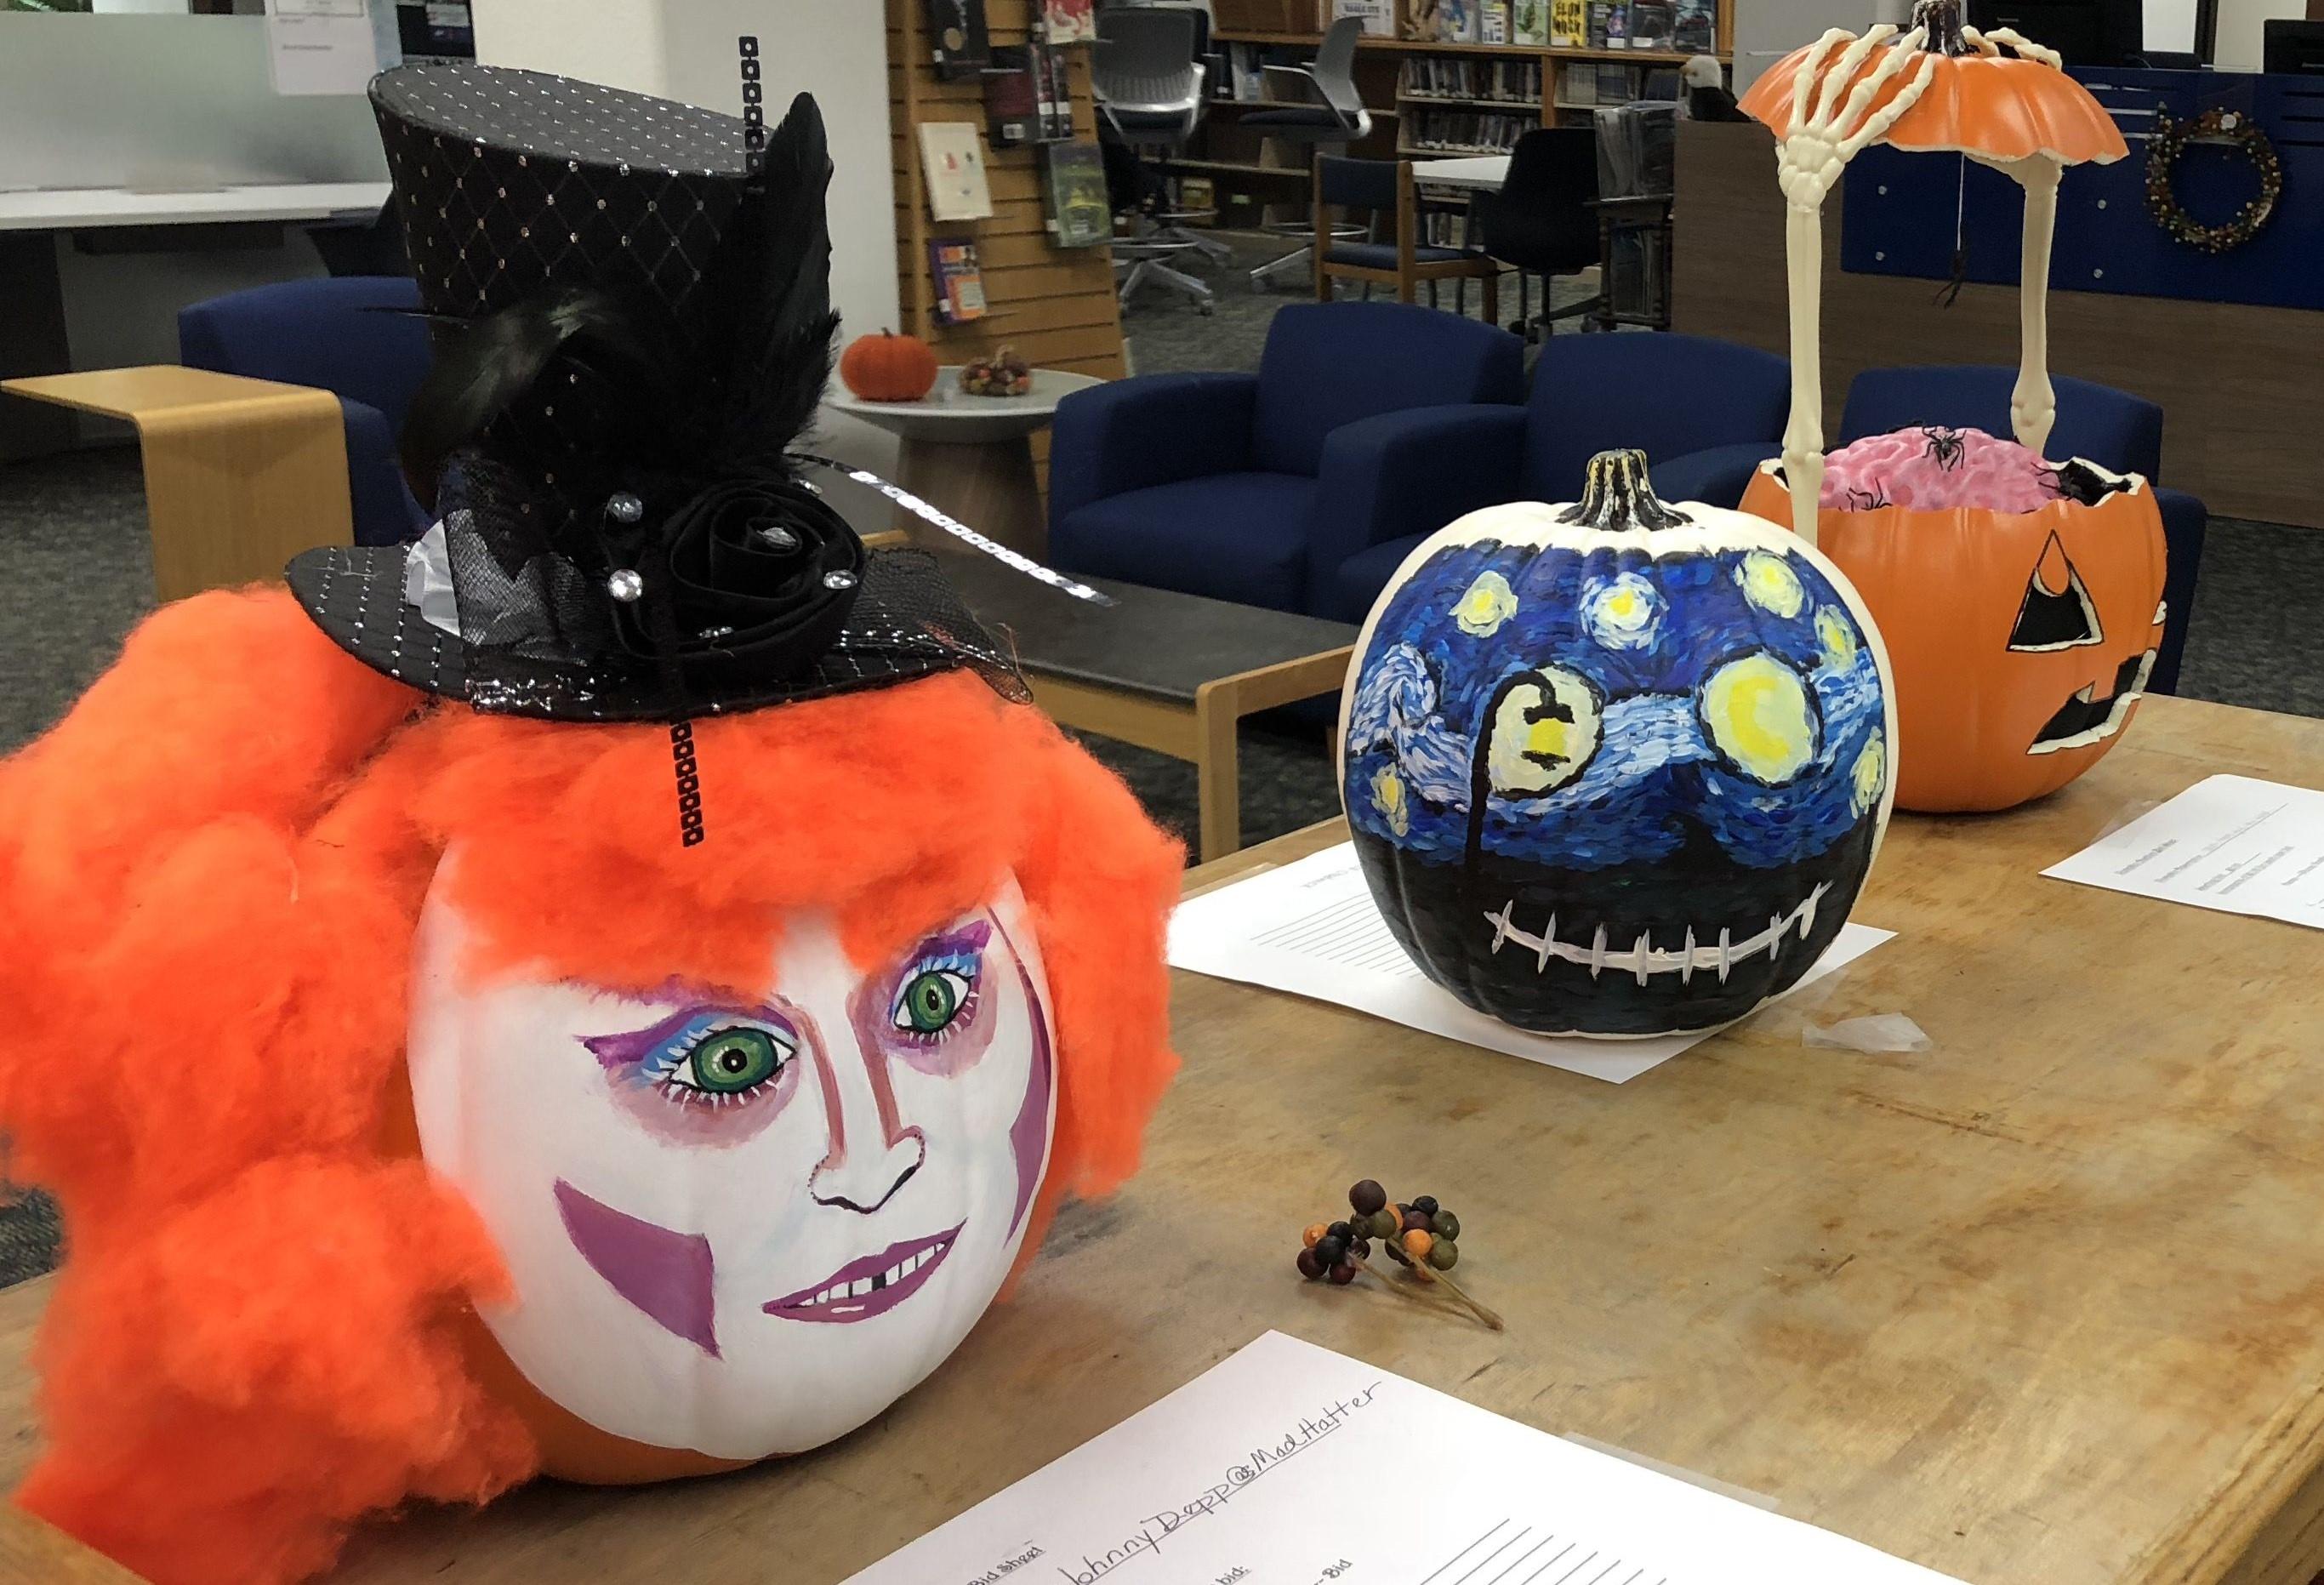 Painted Pumpkin Contest Begins New Halloween Tradition On Campus Campus News Santa Margarita Catholic High School